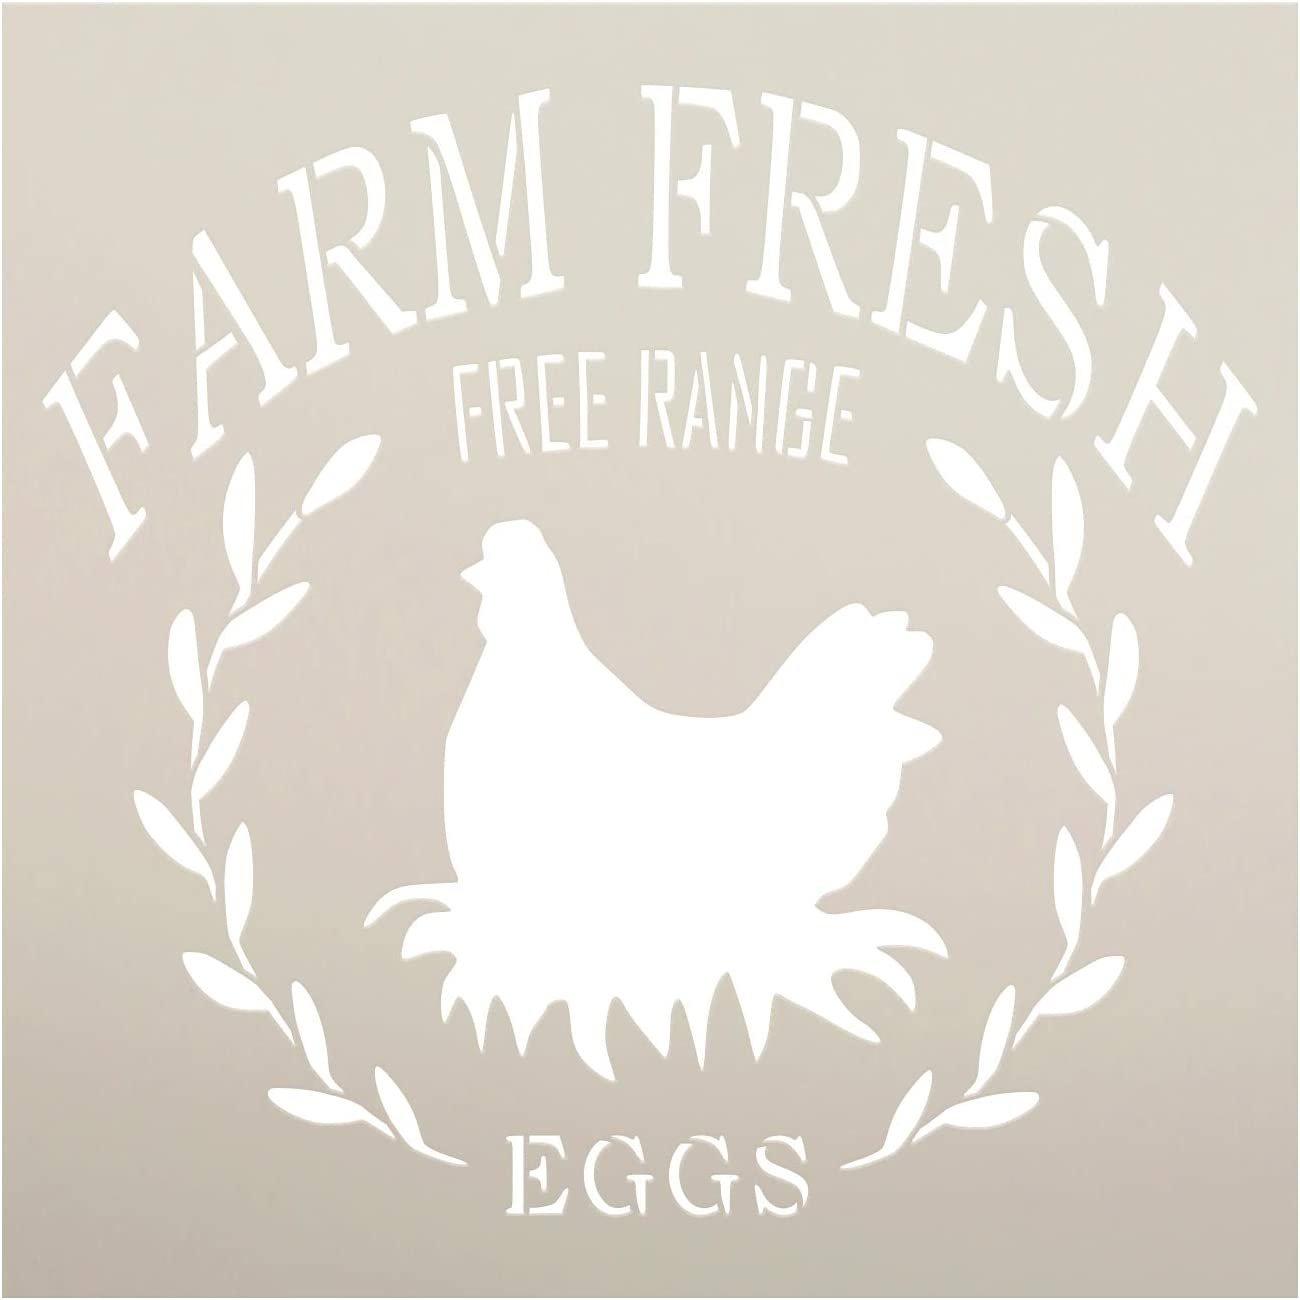 Farm Fresh Free Range Eggs Stencil by StudioR12 | DIY Chicken Laurel Wreath Home Decor | Craft & Paint Wood Sign | Reusable Mylar Template | Rustic Kitchen Barn | Select Size